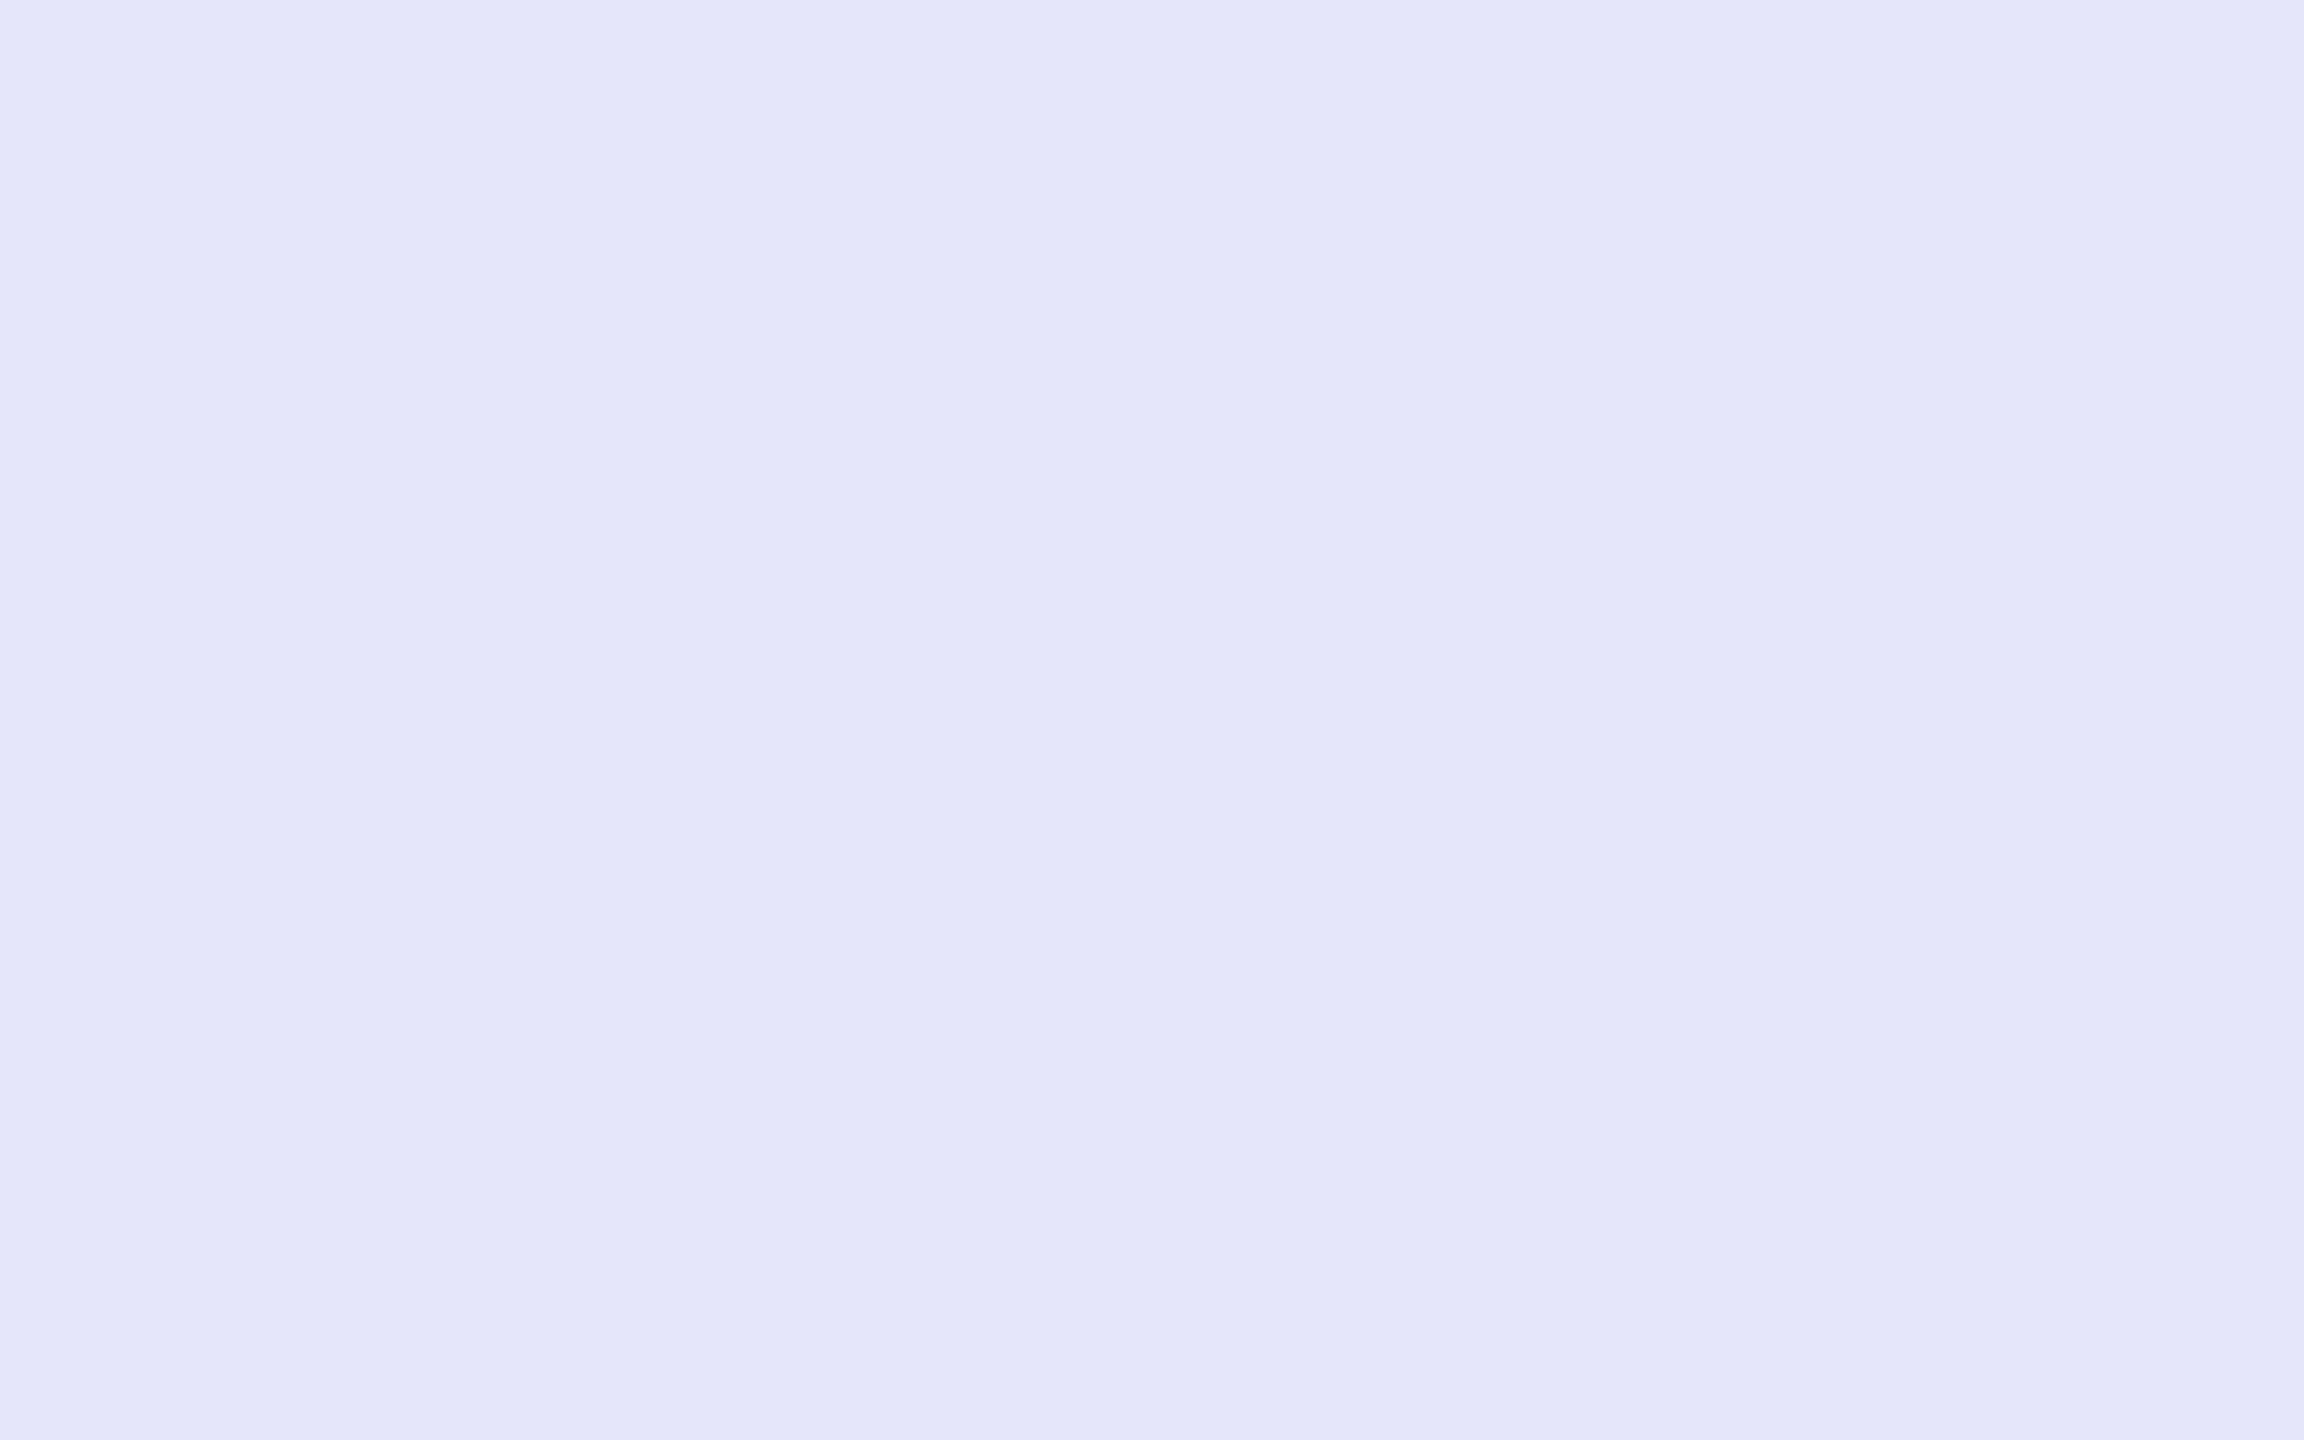 2304x1440 Lavender Web Solid Color Background